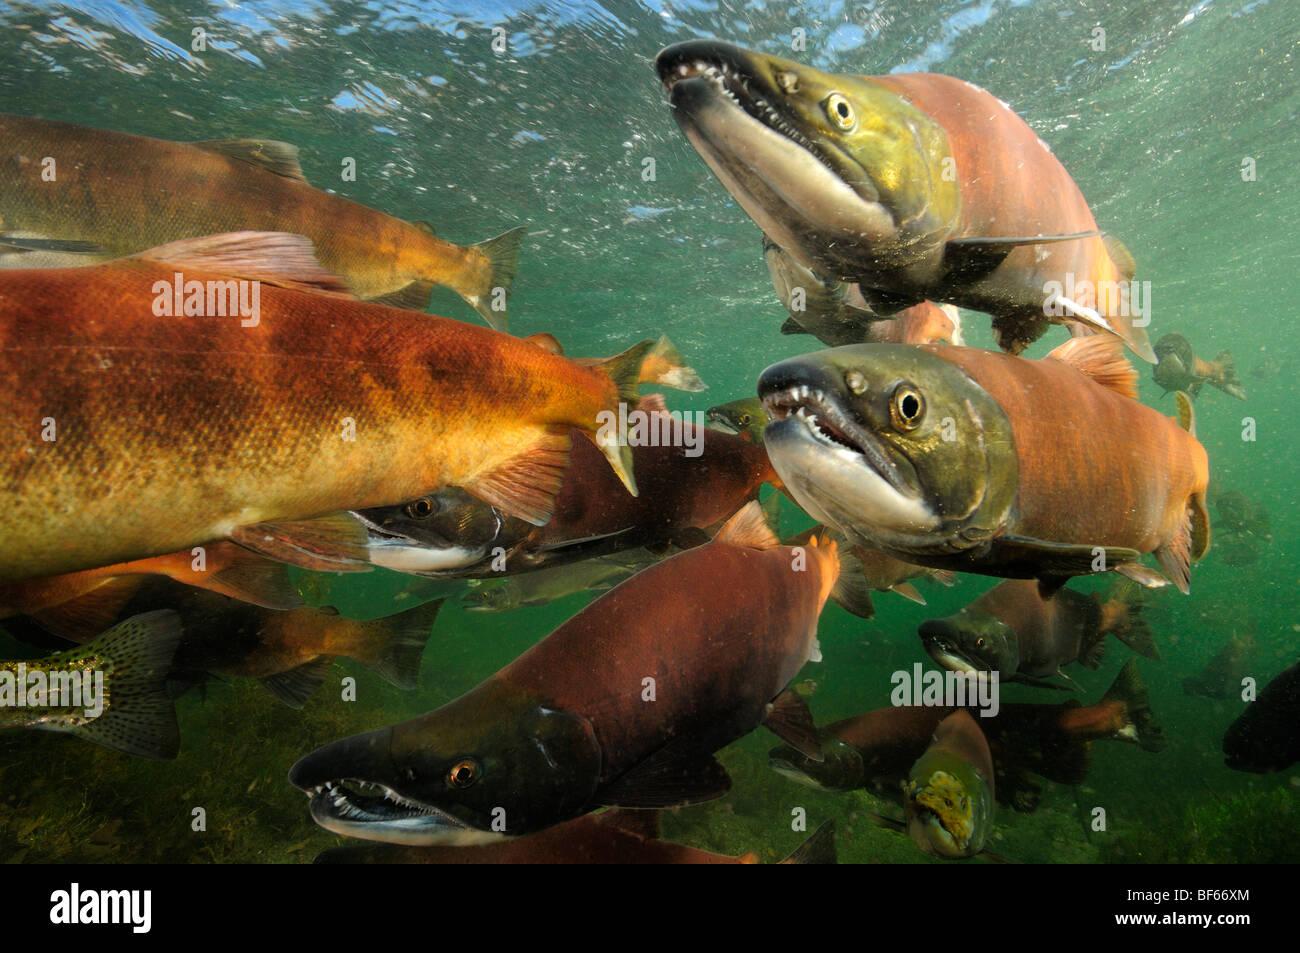 Rojo Salmón, Oncorhynchus nerka, Kokanee, East River, Colorado Imagen De Stock